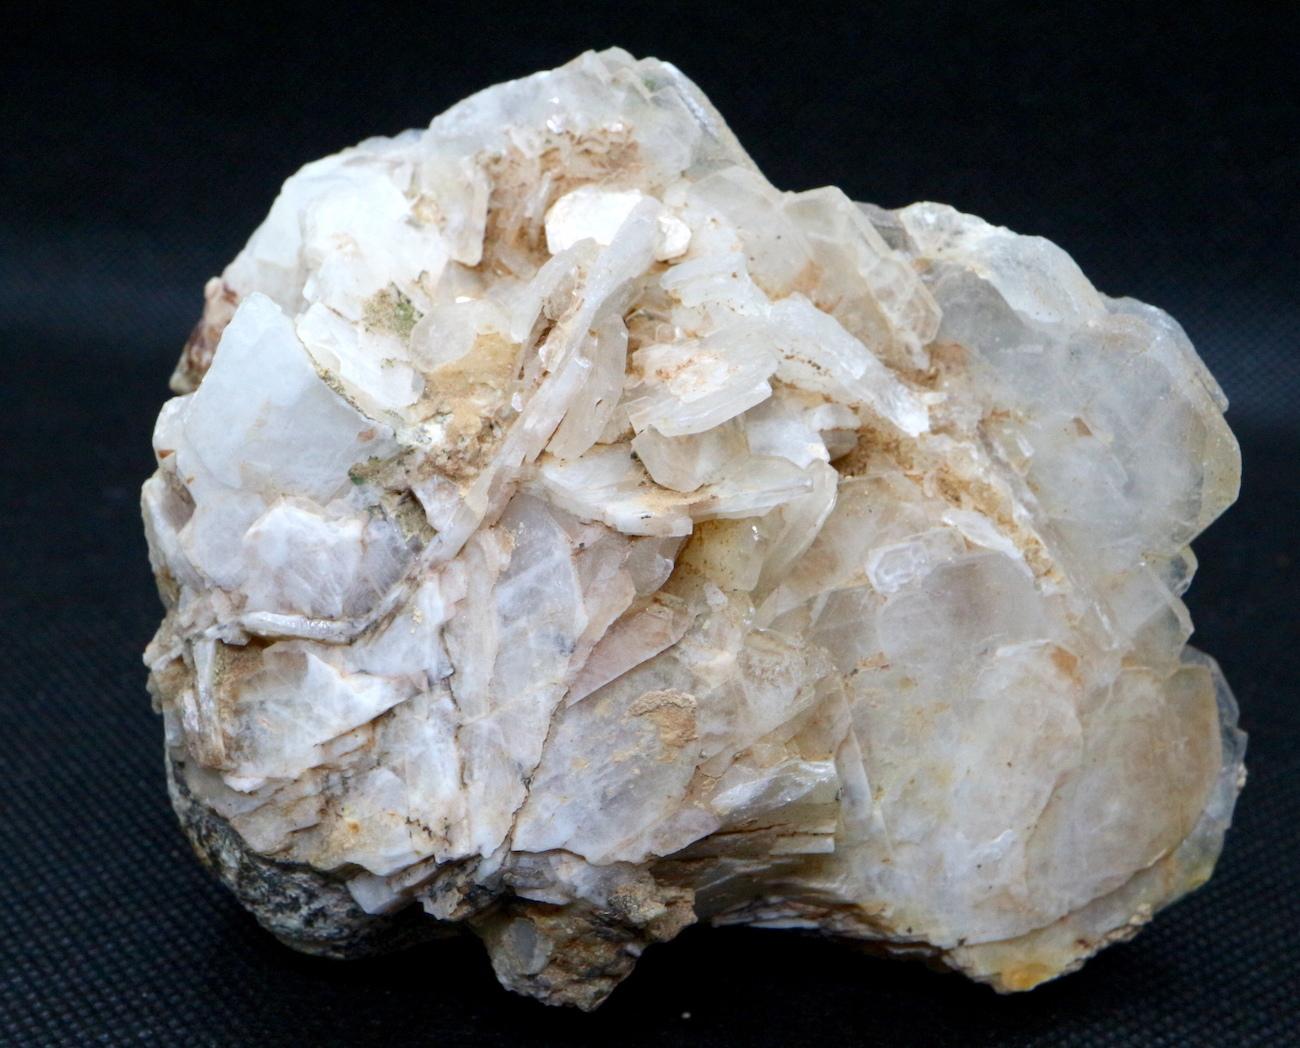 ※SALE※動画あり!アメリカ産! 重晶石 Barite バライト 531g   BRT002 鉱物 天然石 パワーストーン 原石